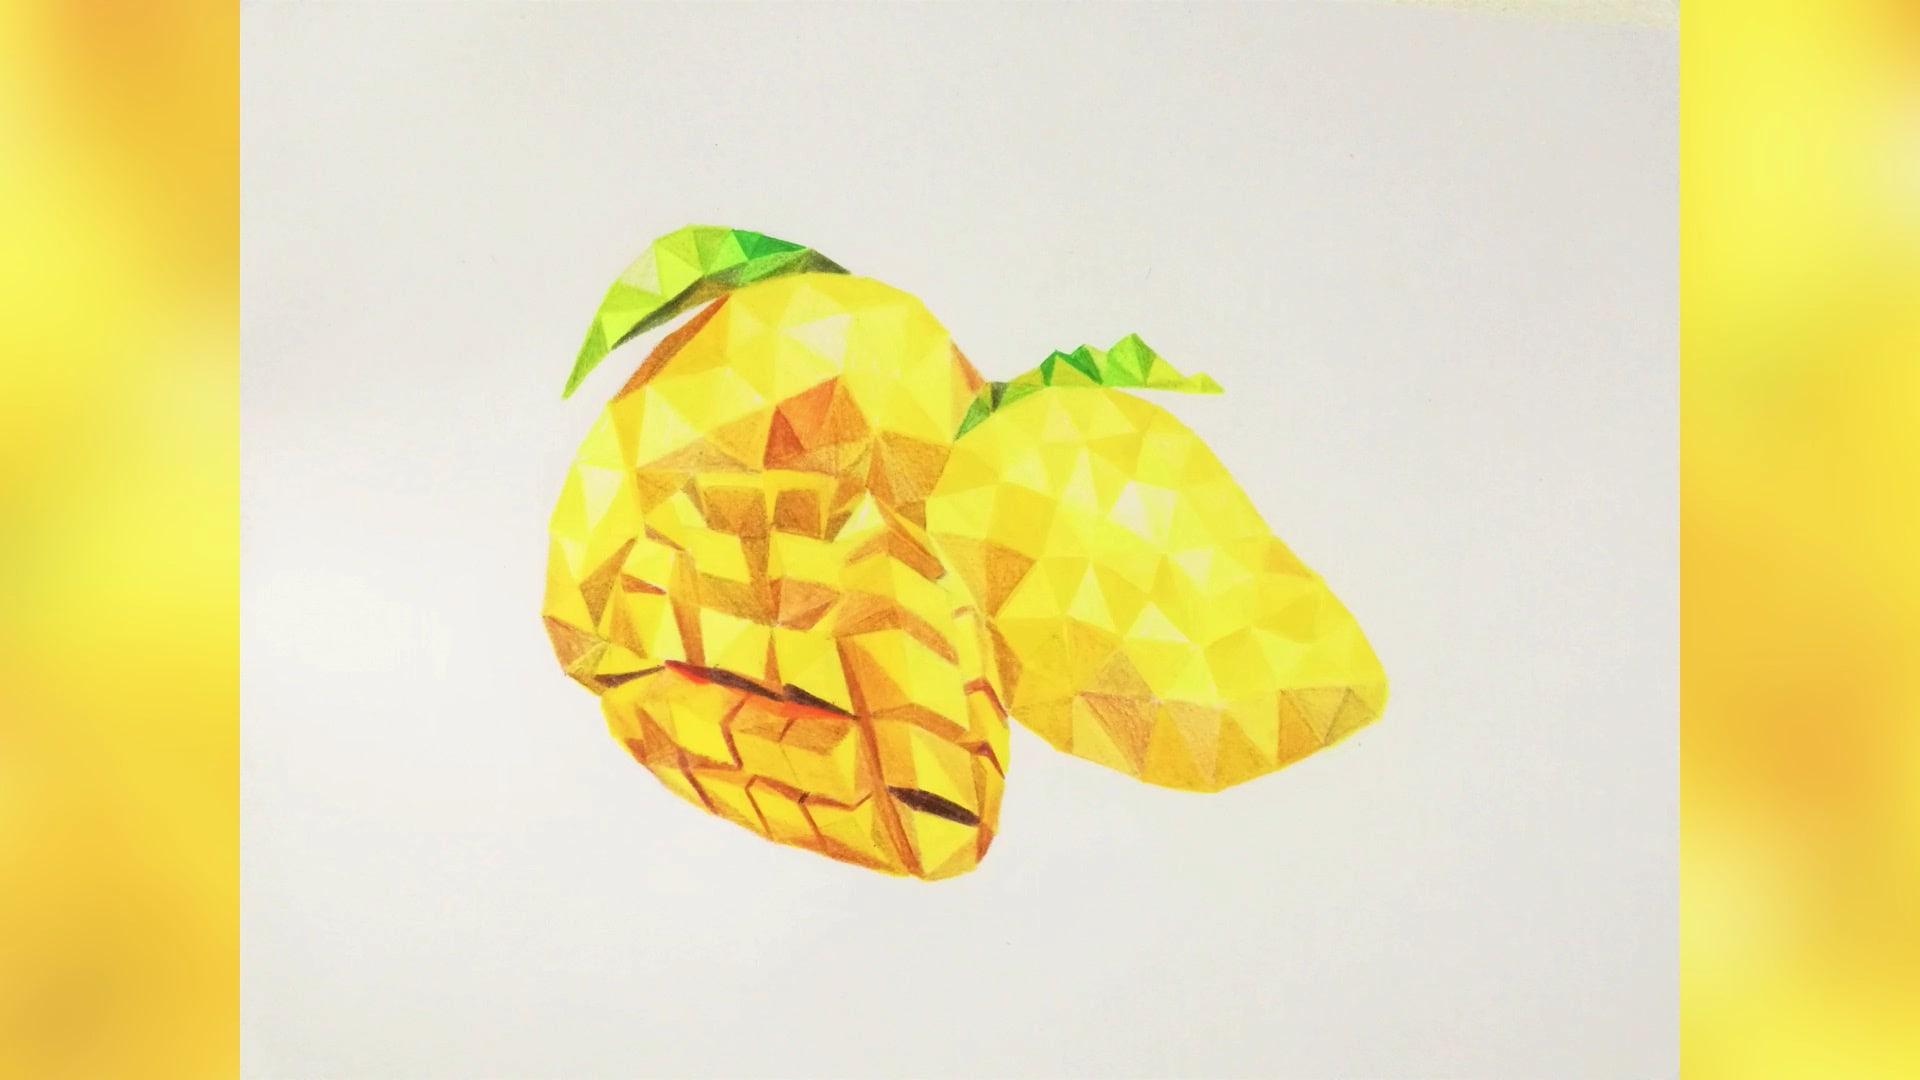 Interior Design by Kaeious Art seen at Private Residence, Kulim - Kaeious Ooi Polygonal Art - The Fruits Series